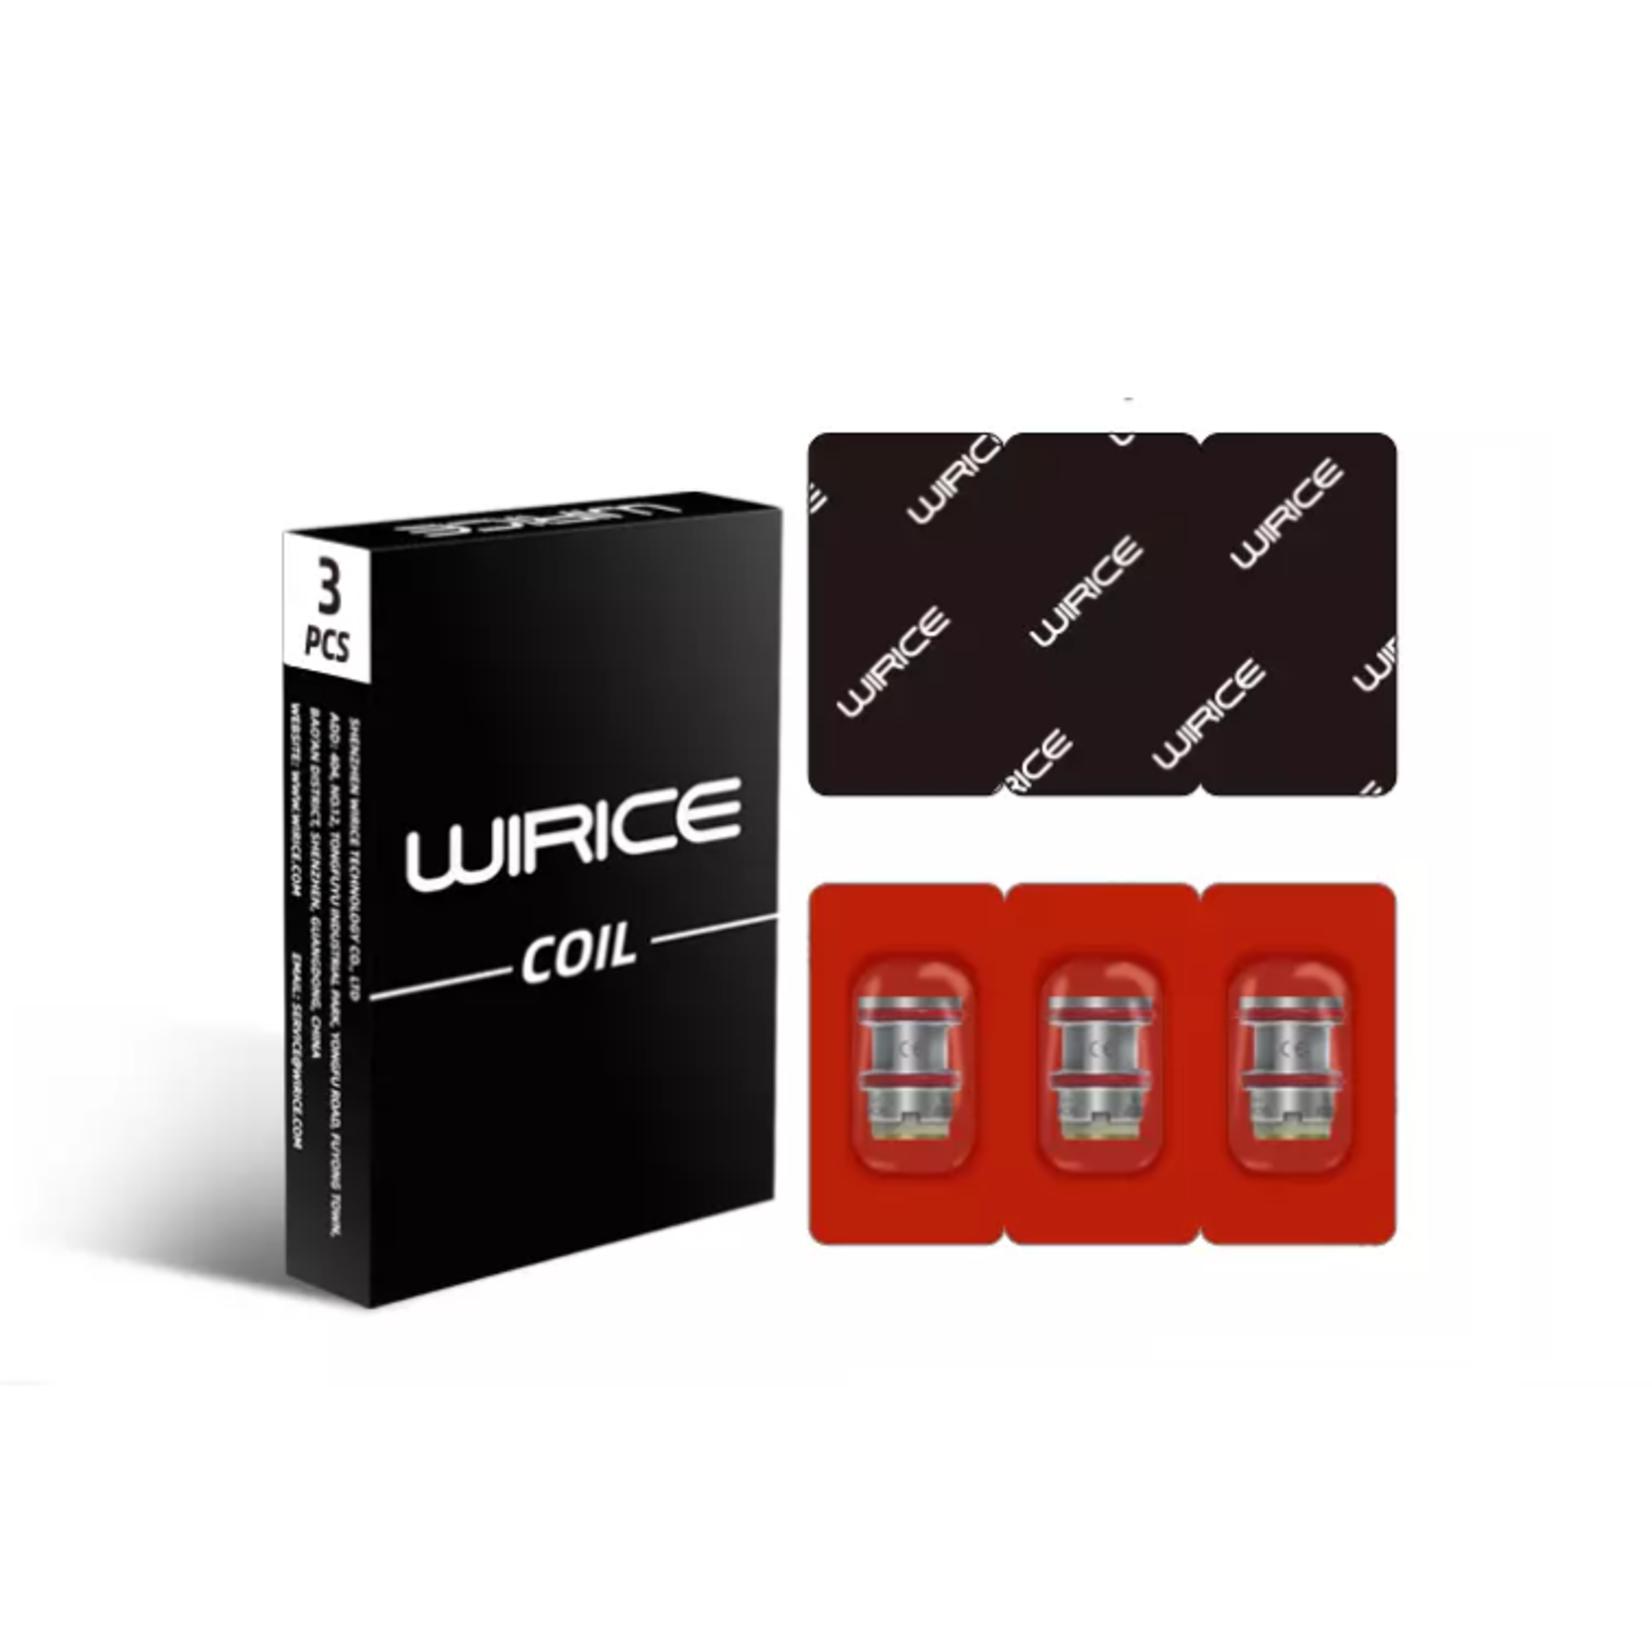 Wirice Launcher Coils